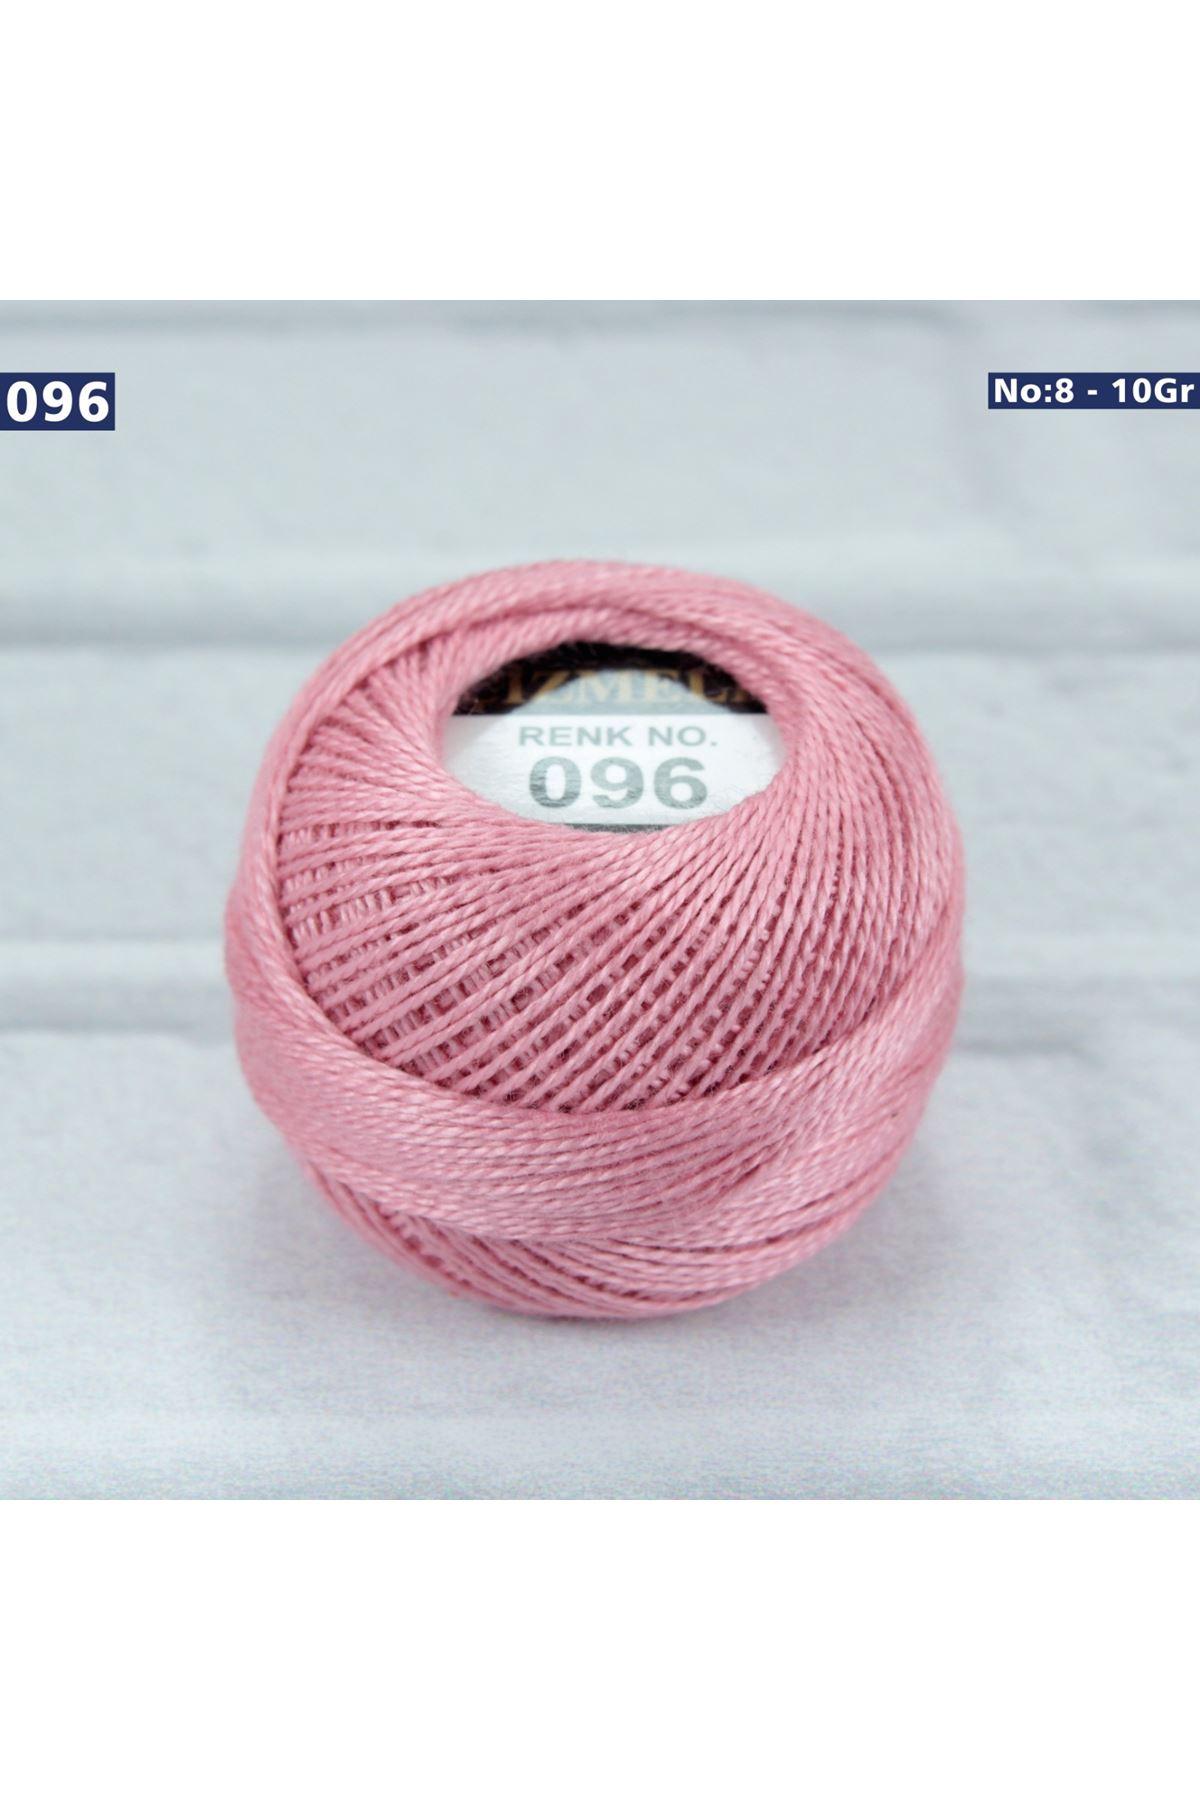 Çizmeli Cotton Perle Nakış İpliği No: 096